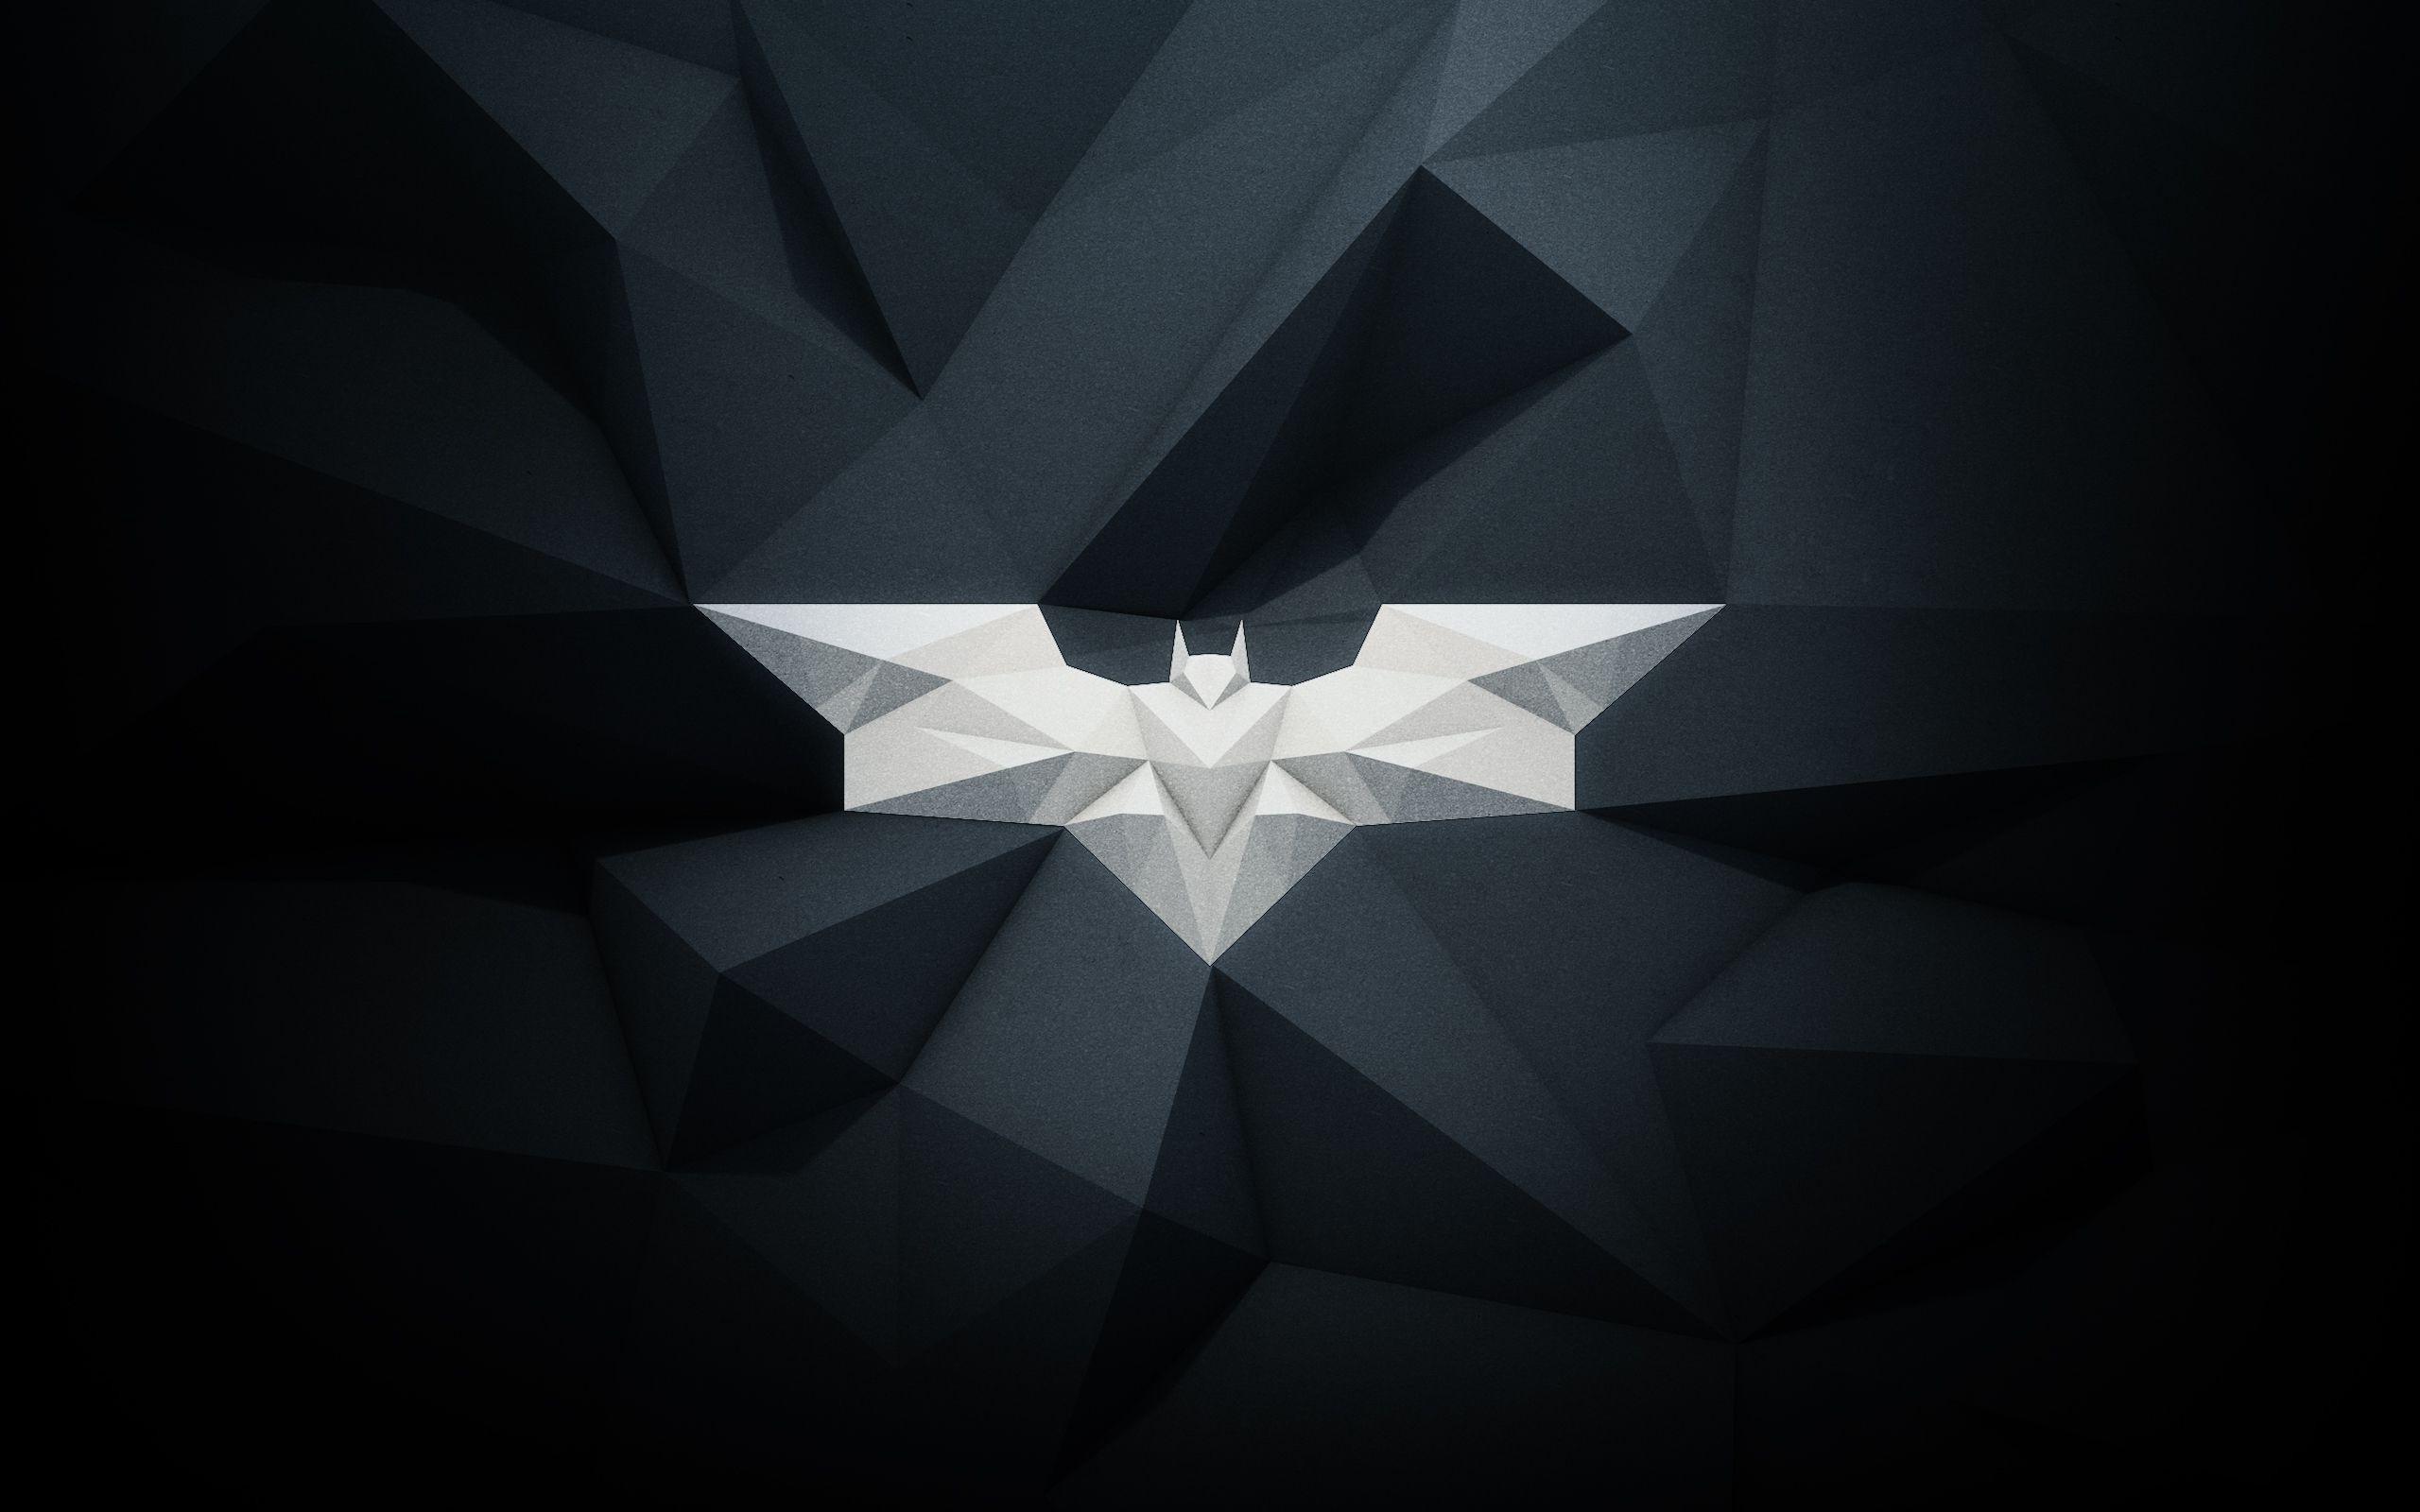 Batman Logo Wallpapers   Full HD wallpaper search 2560x1600